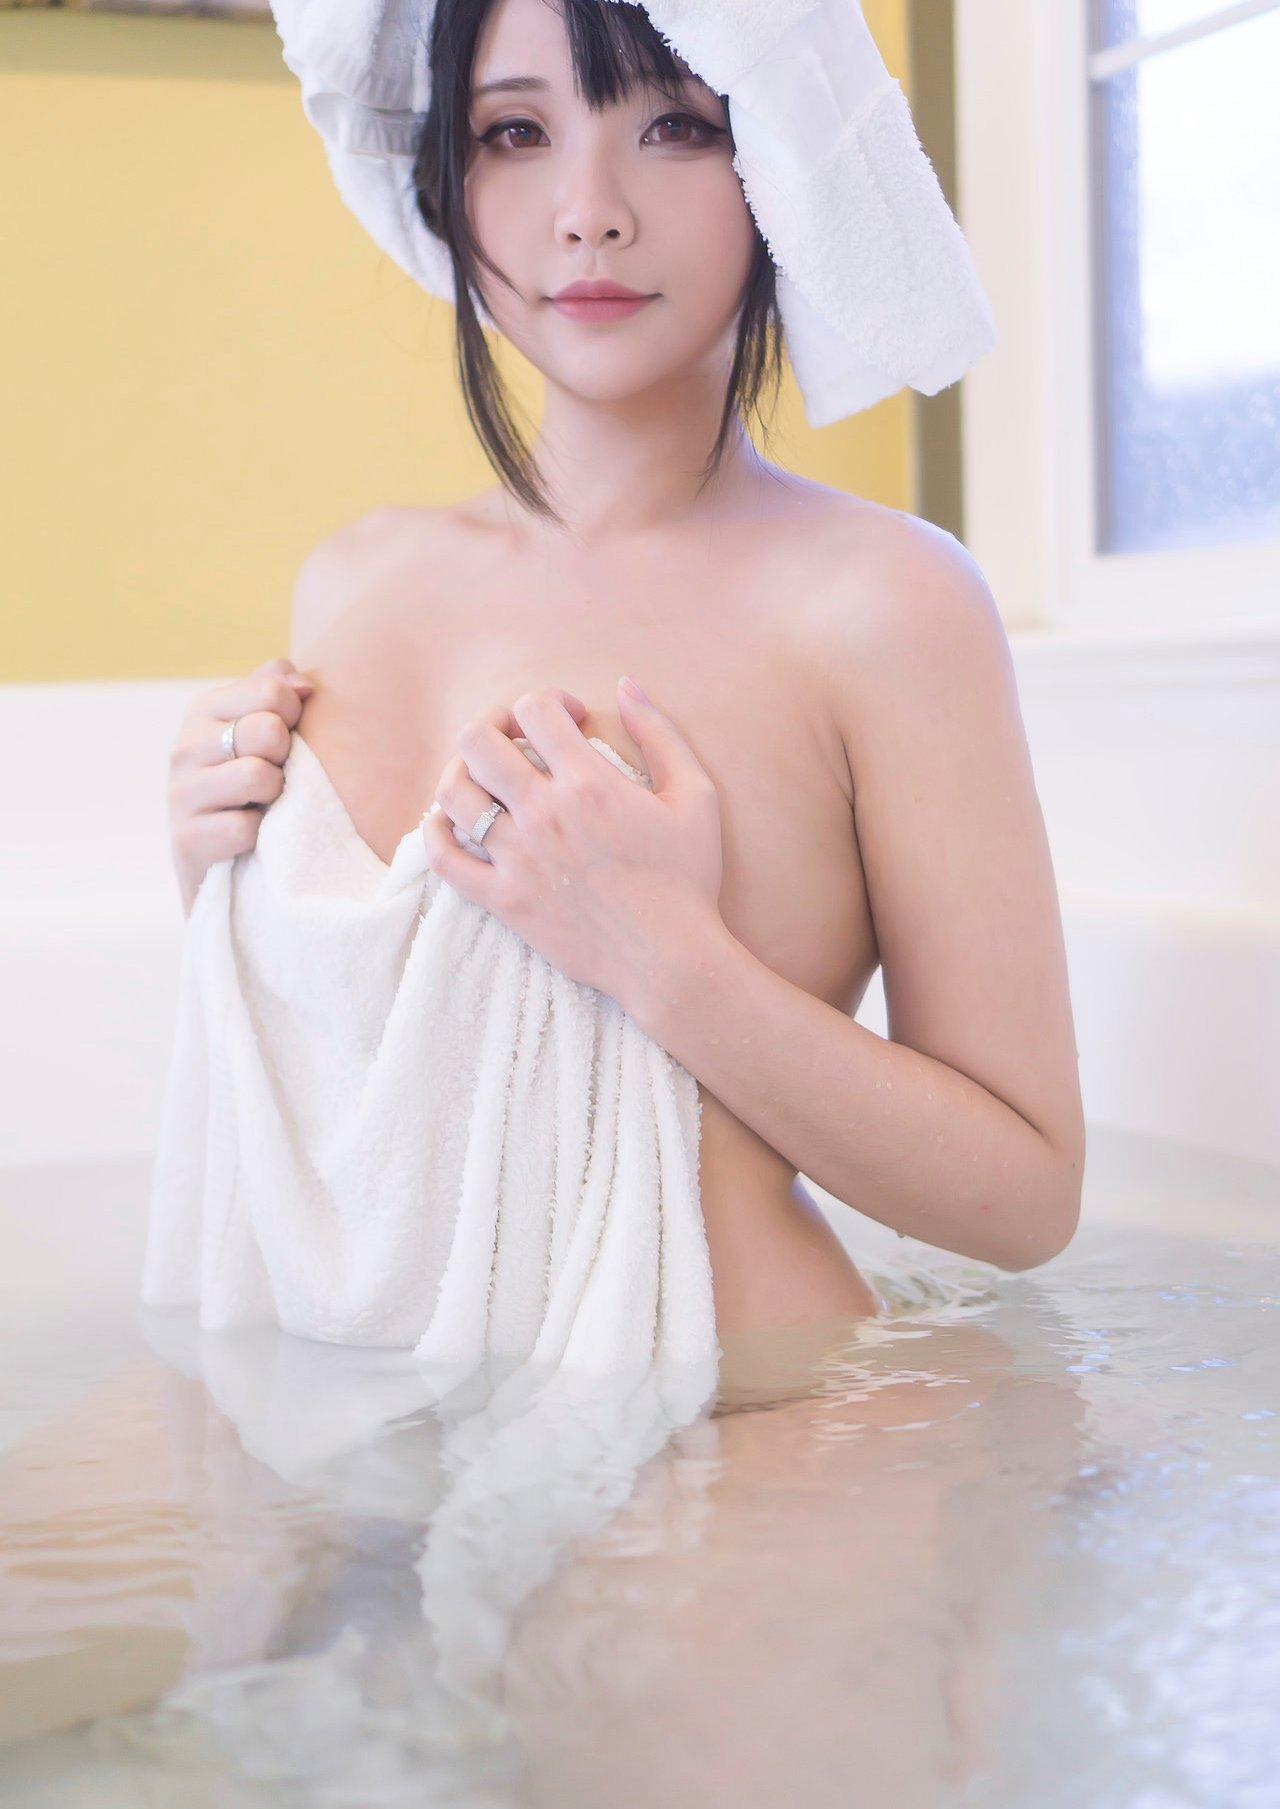 Audrey Bathtub Bunny Twitter Sexy Leaks 0008